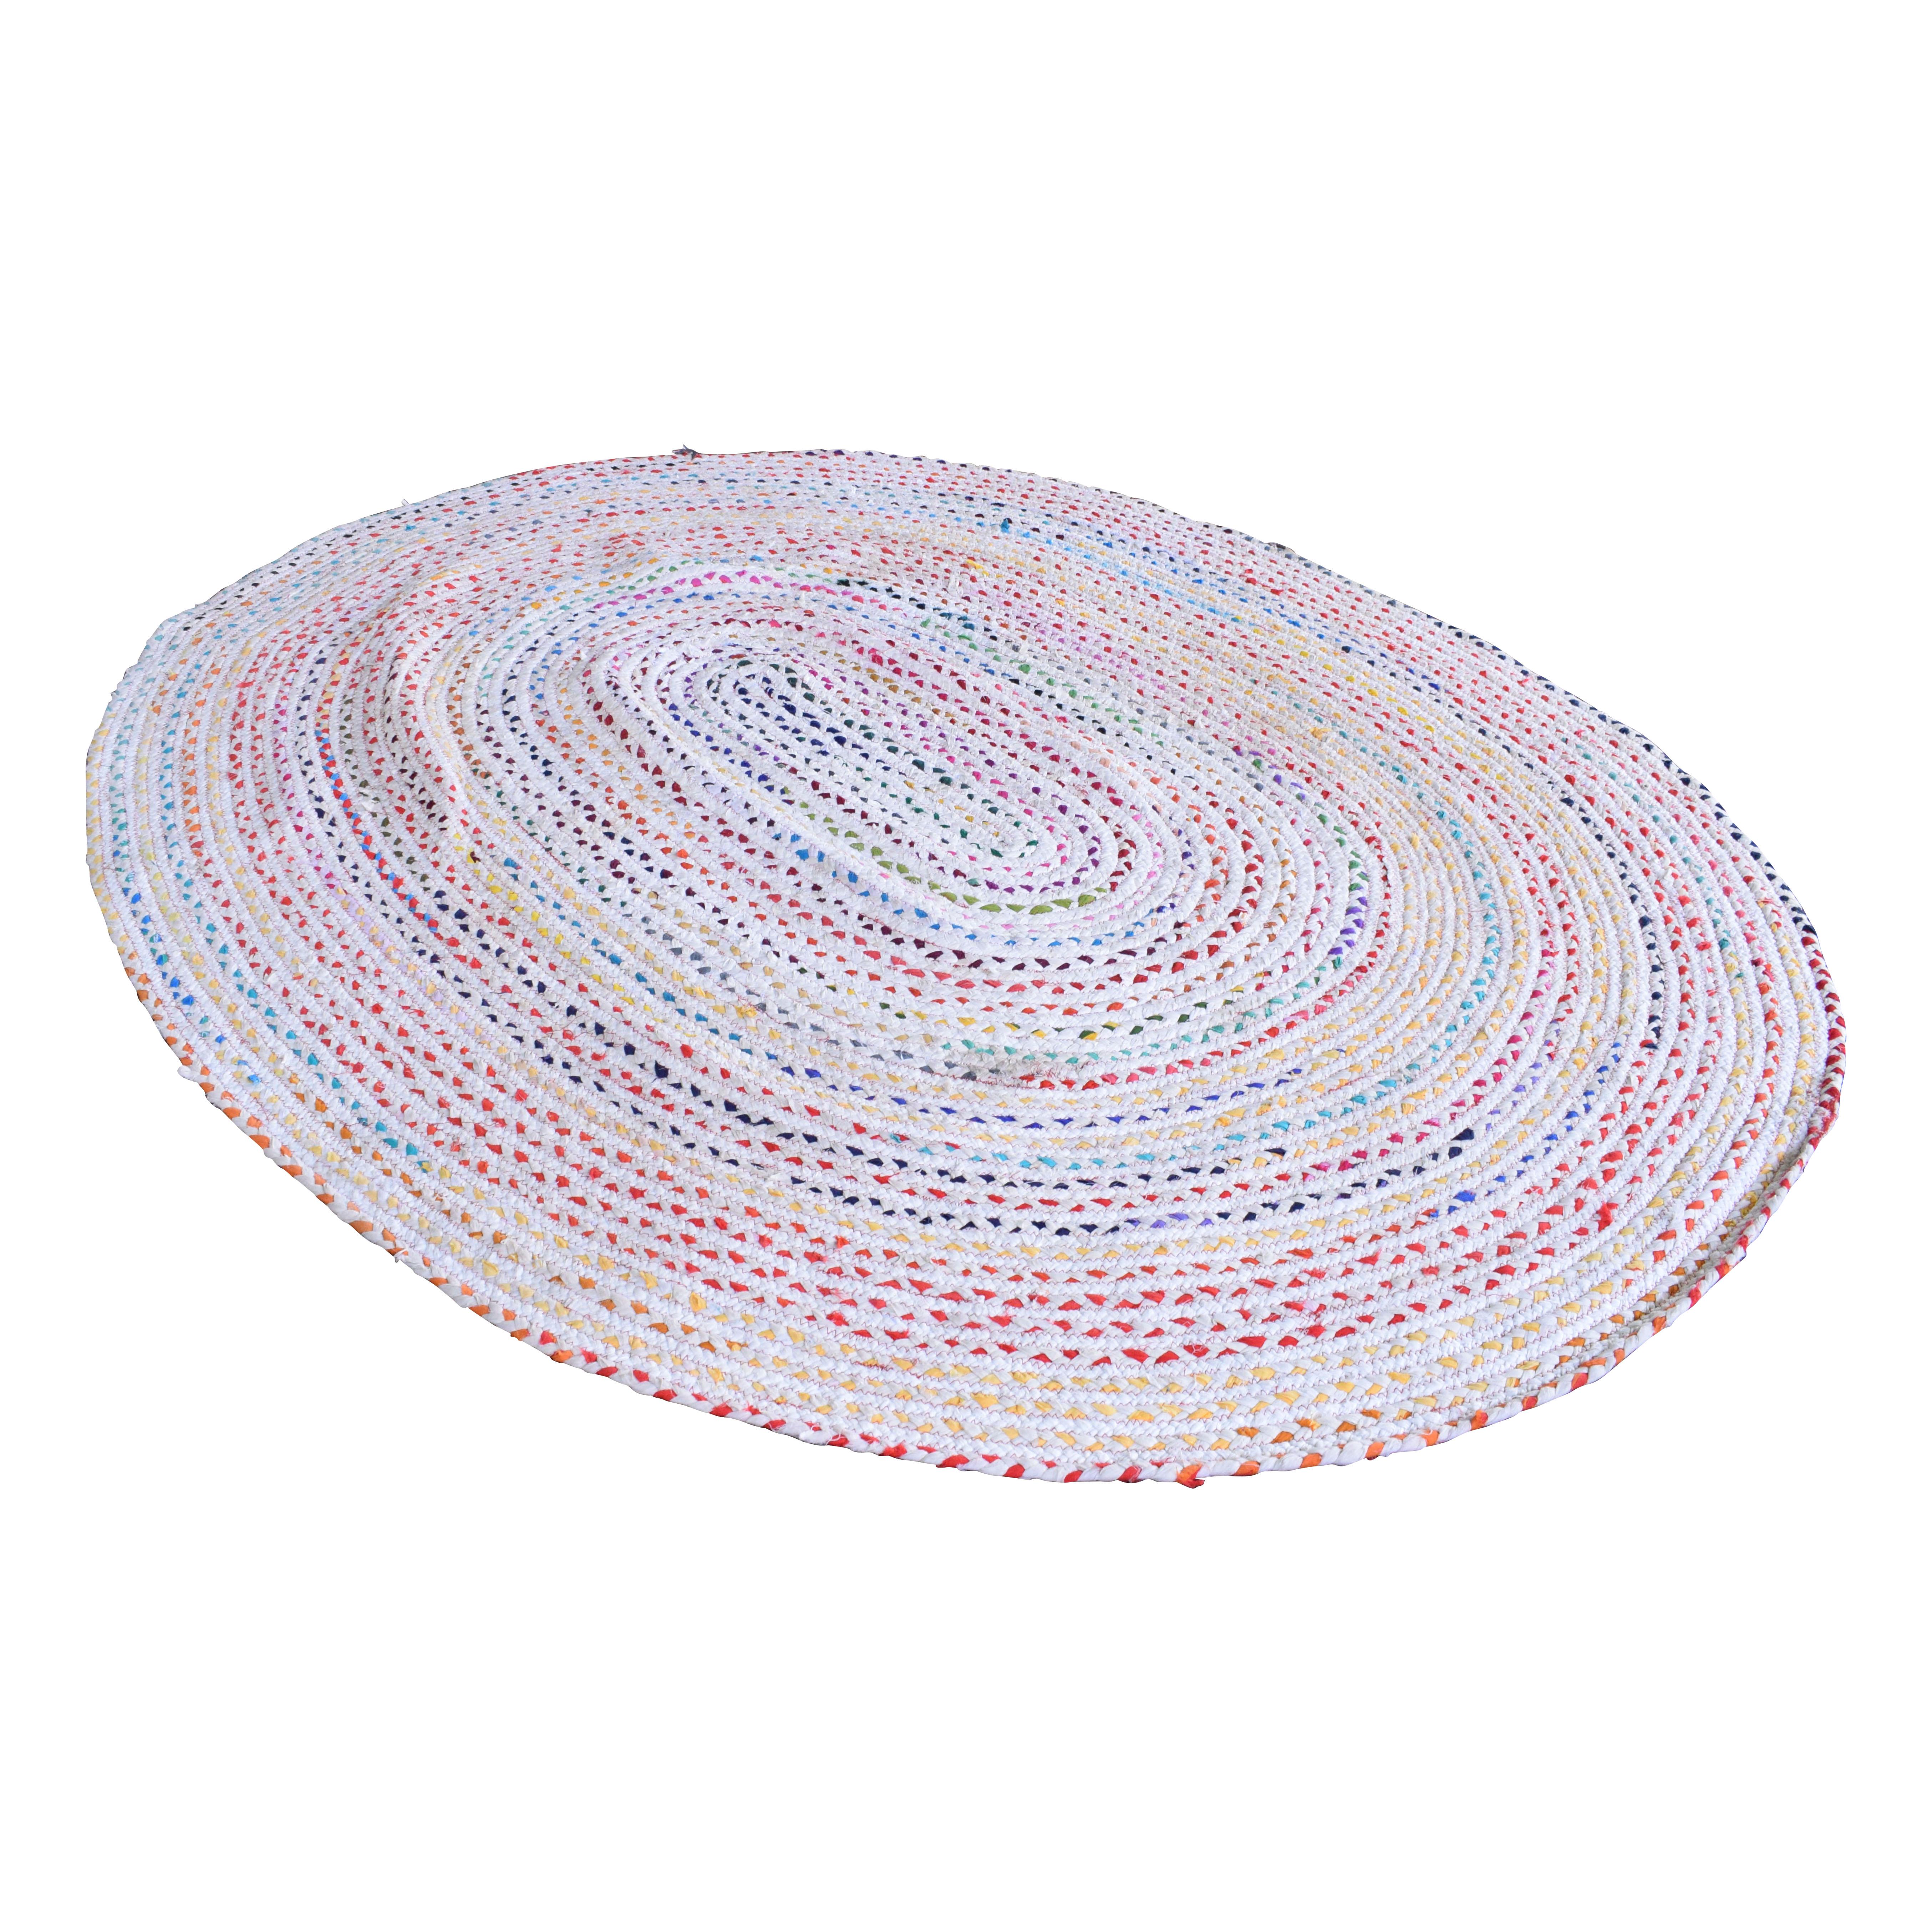 Circular Area Rug second hand